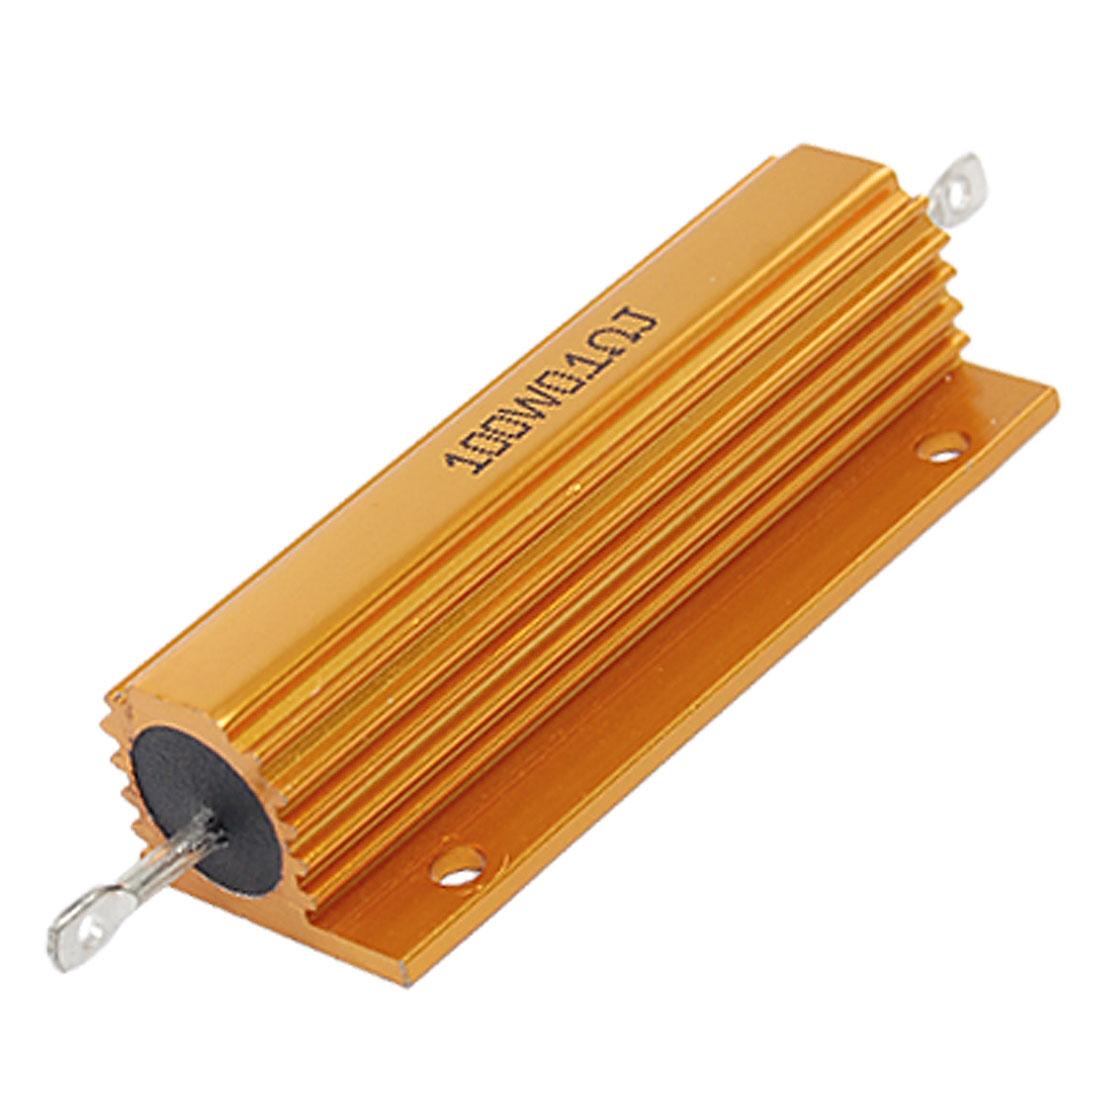 Gold Tone 100W 0.1 Ohm 5% Aluminum Case Wire Wound Resistor